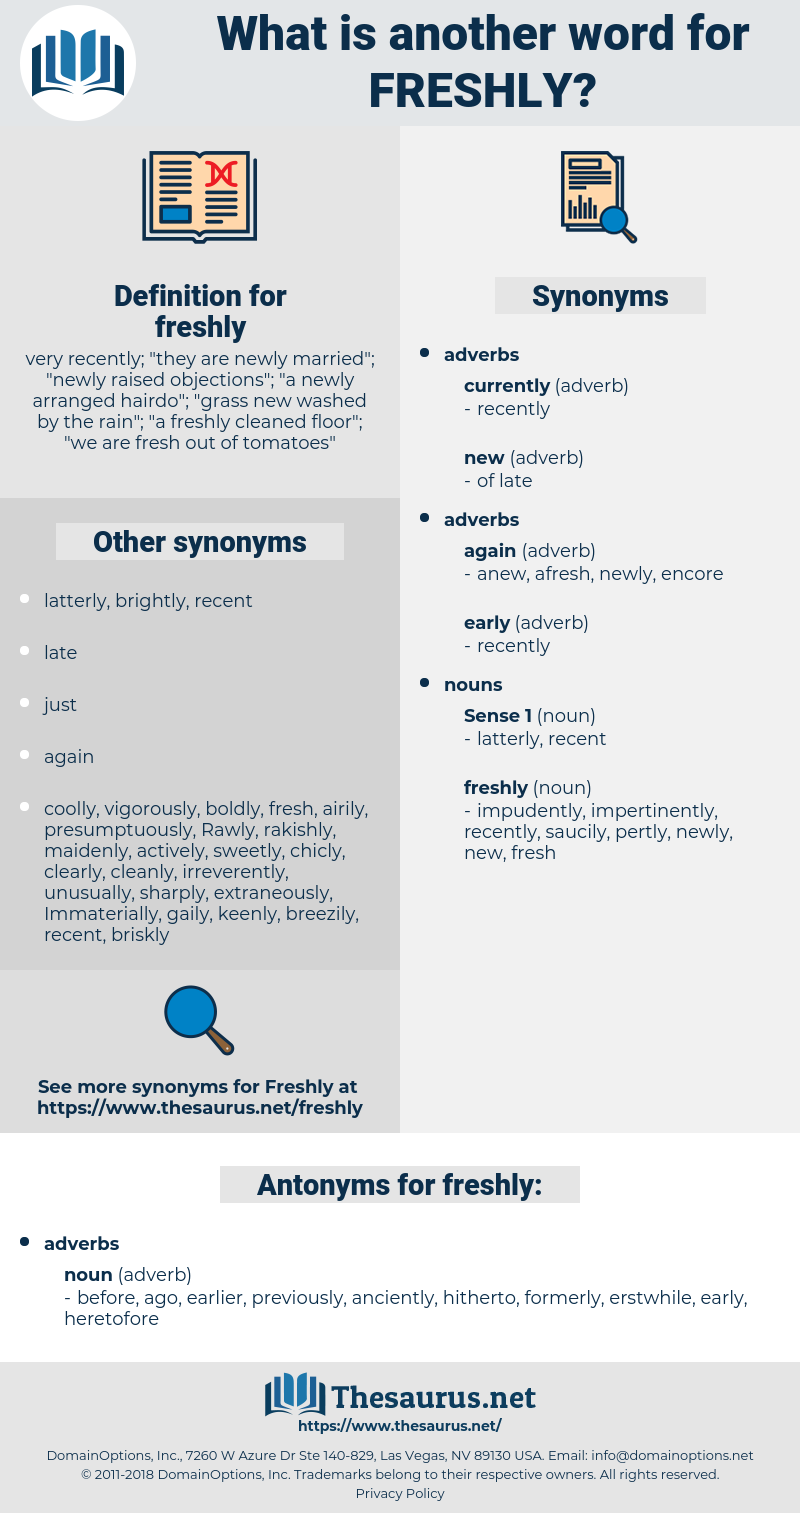 freshly, synonym freshly, another word for freshly, words like freshly, thesaurus freshly